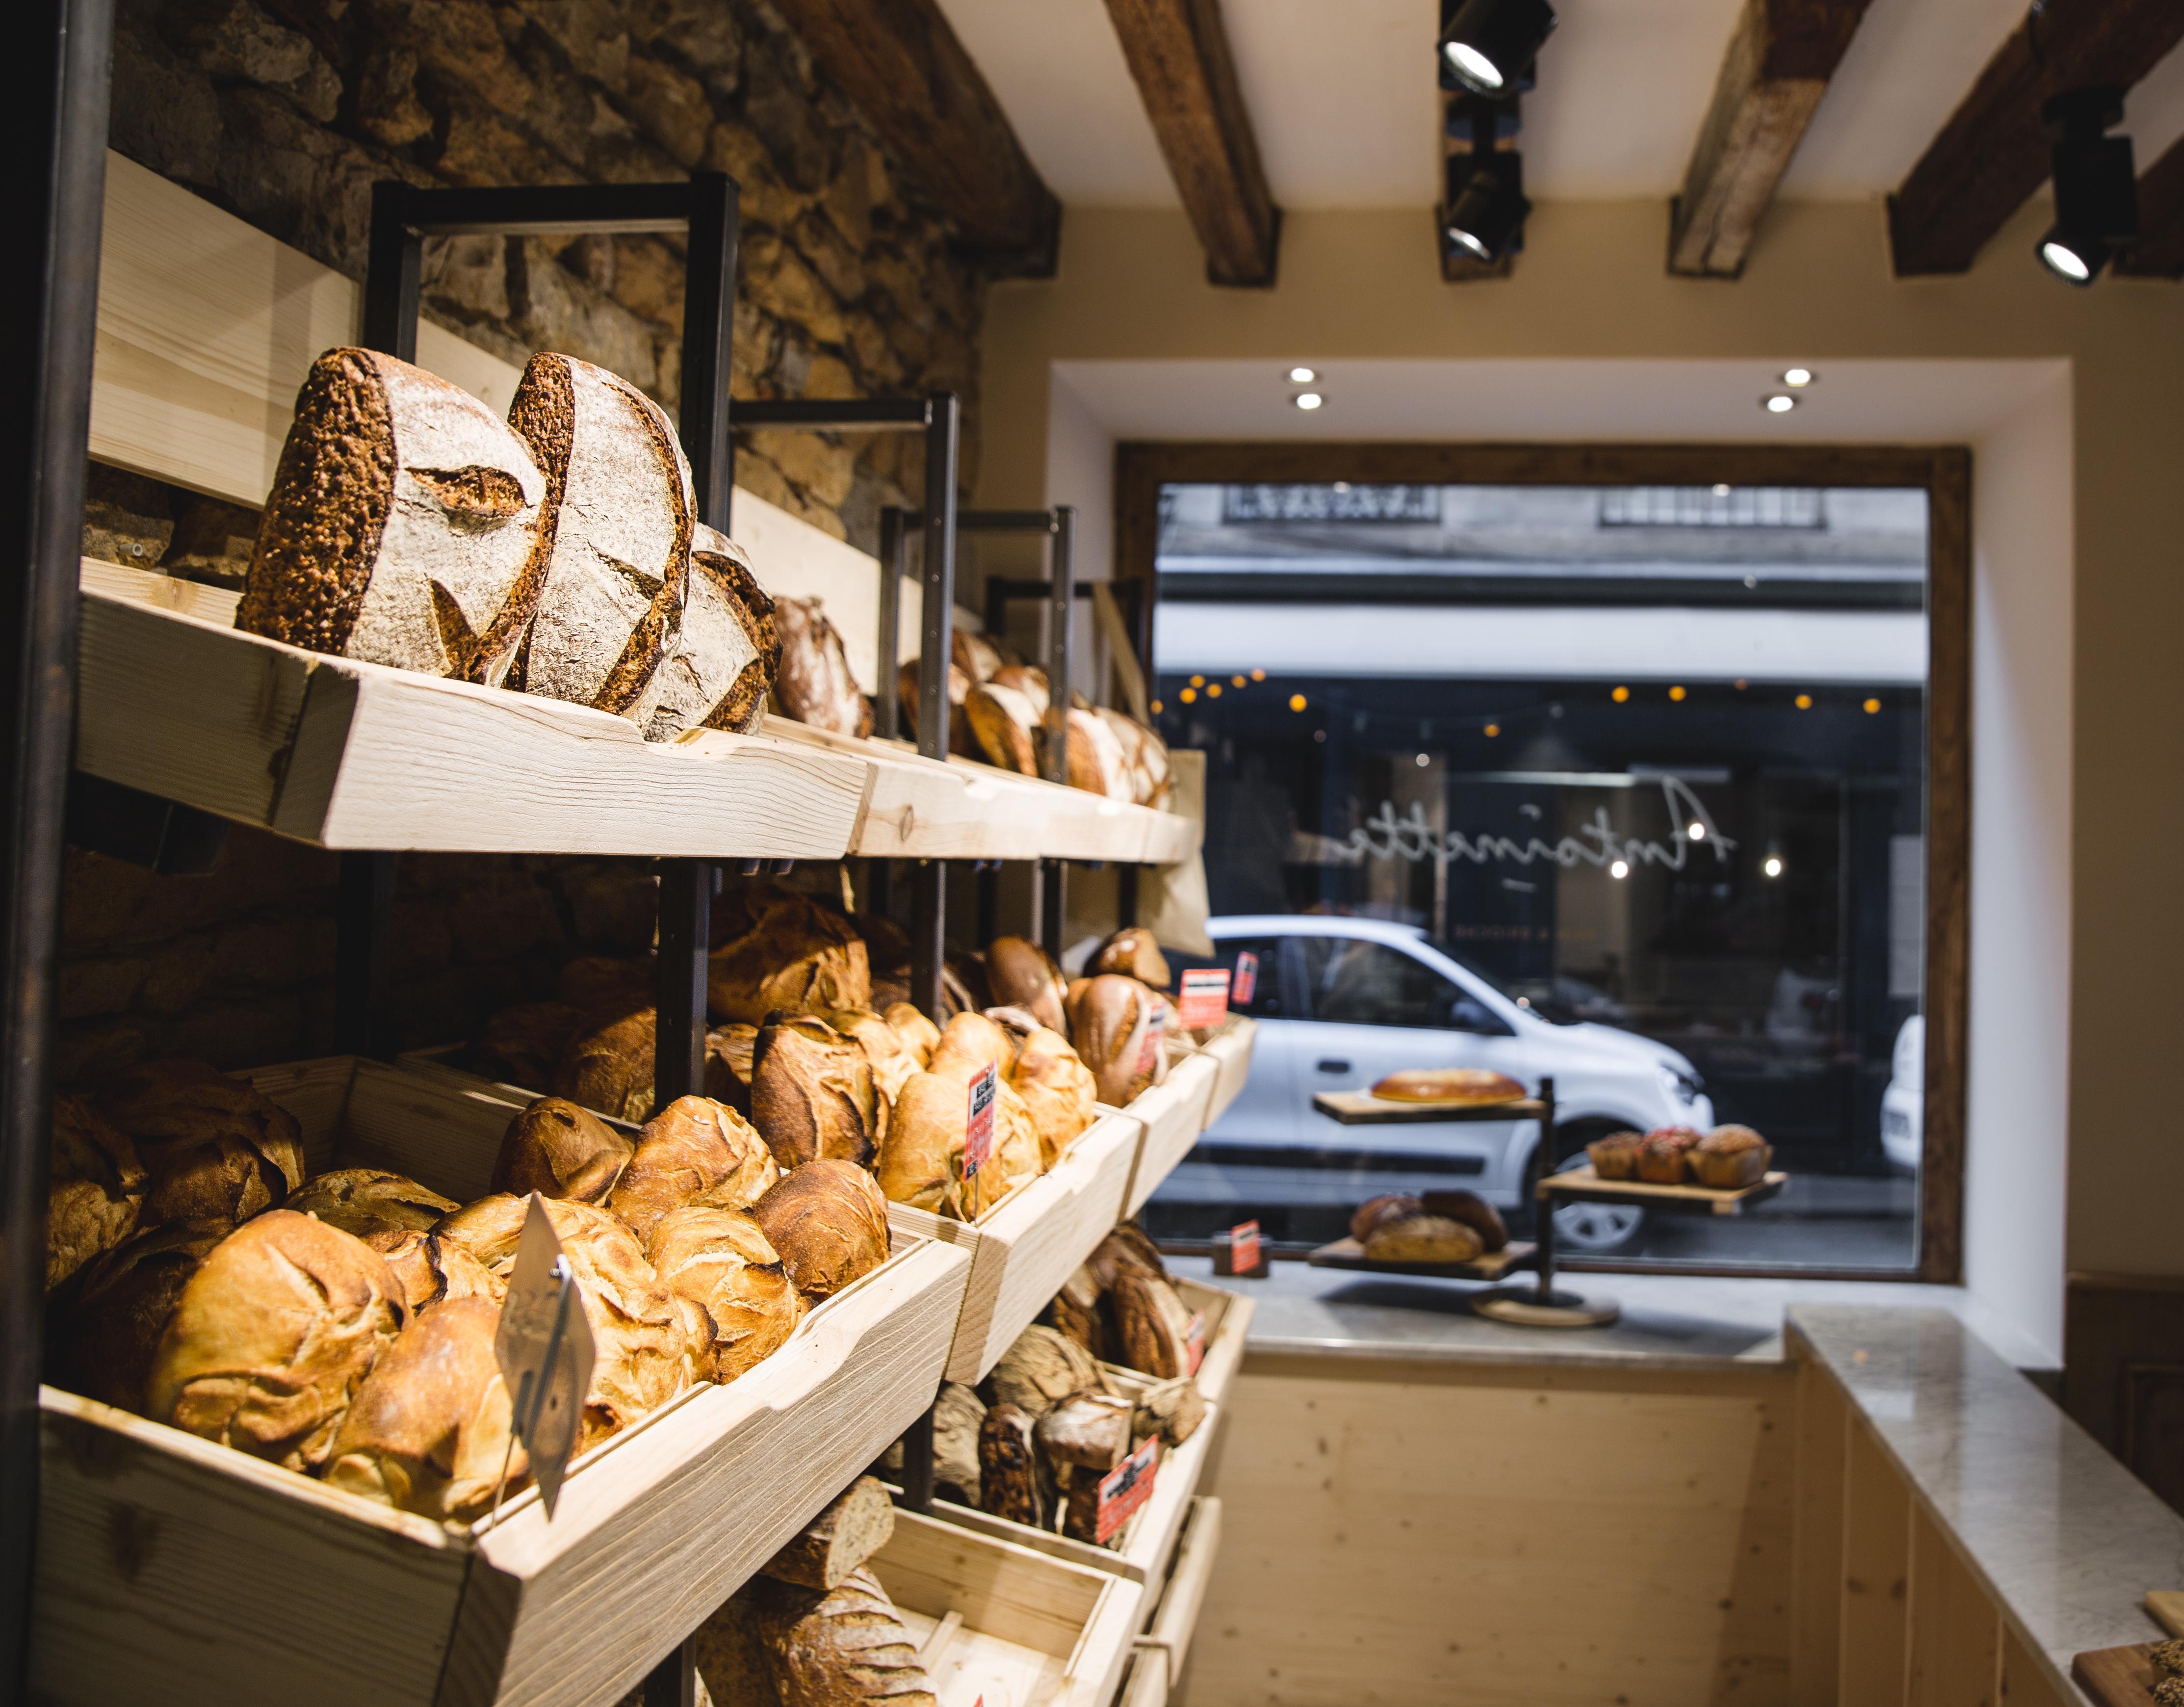 Agencement boulangerie Antoinette pains